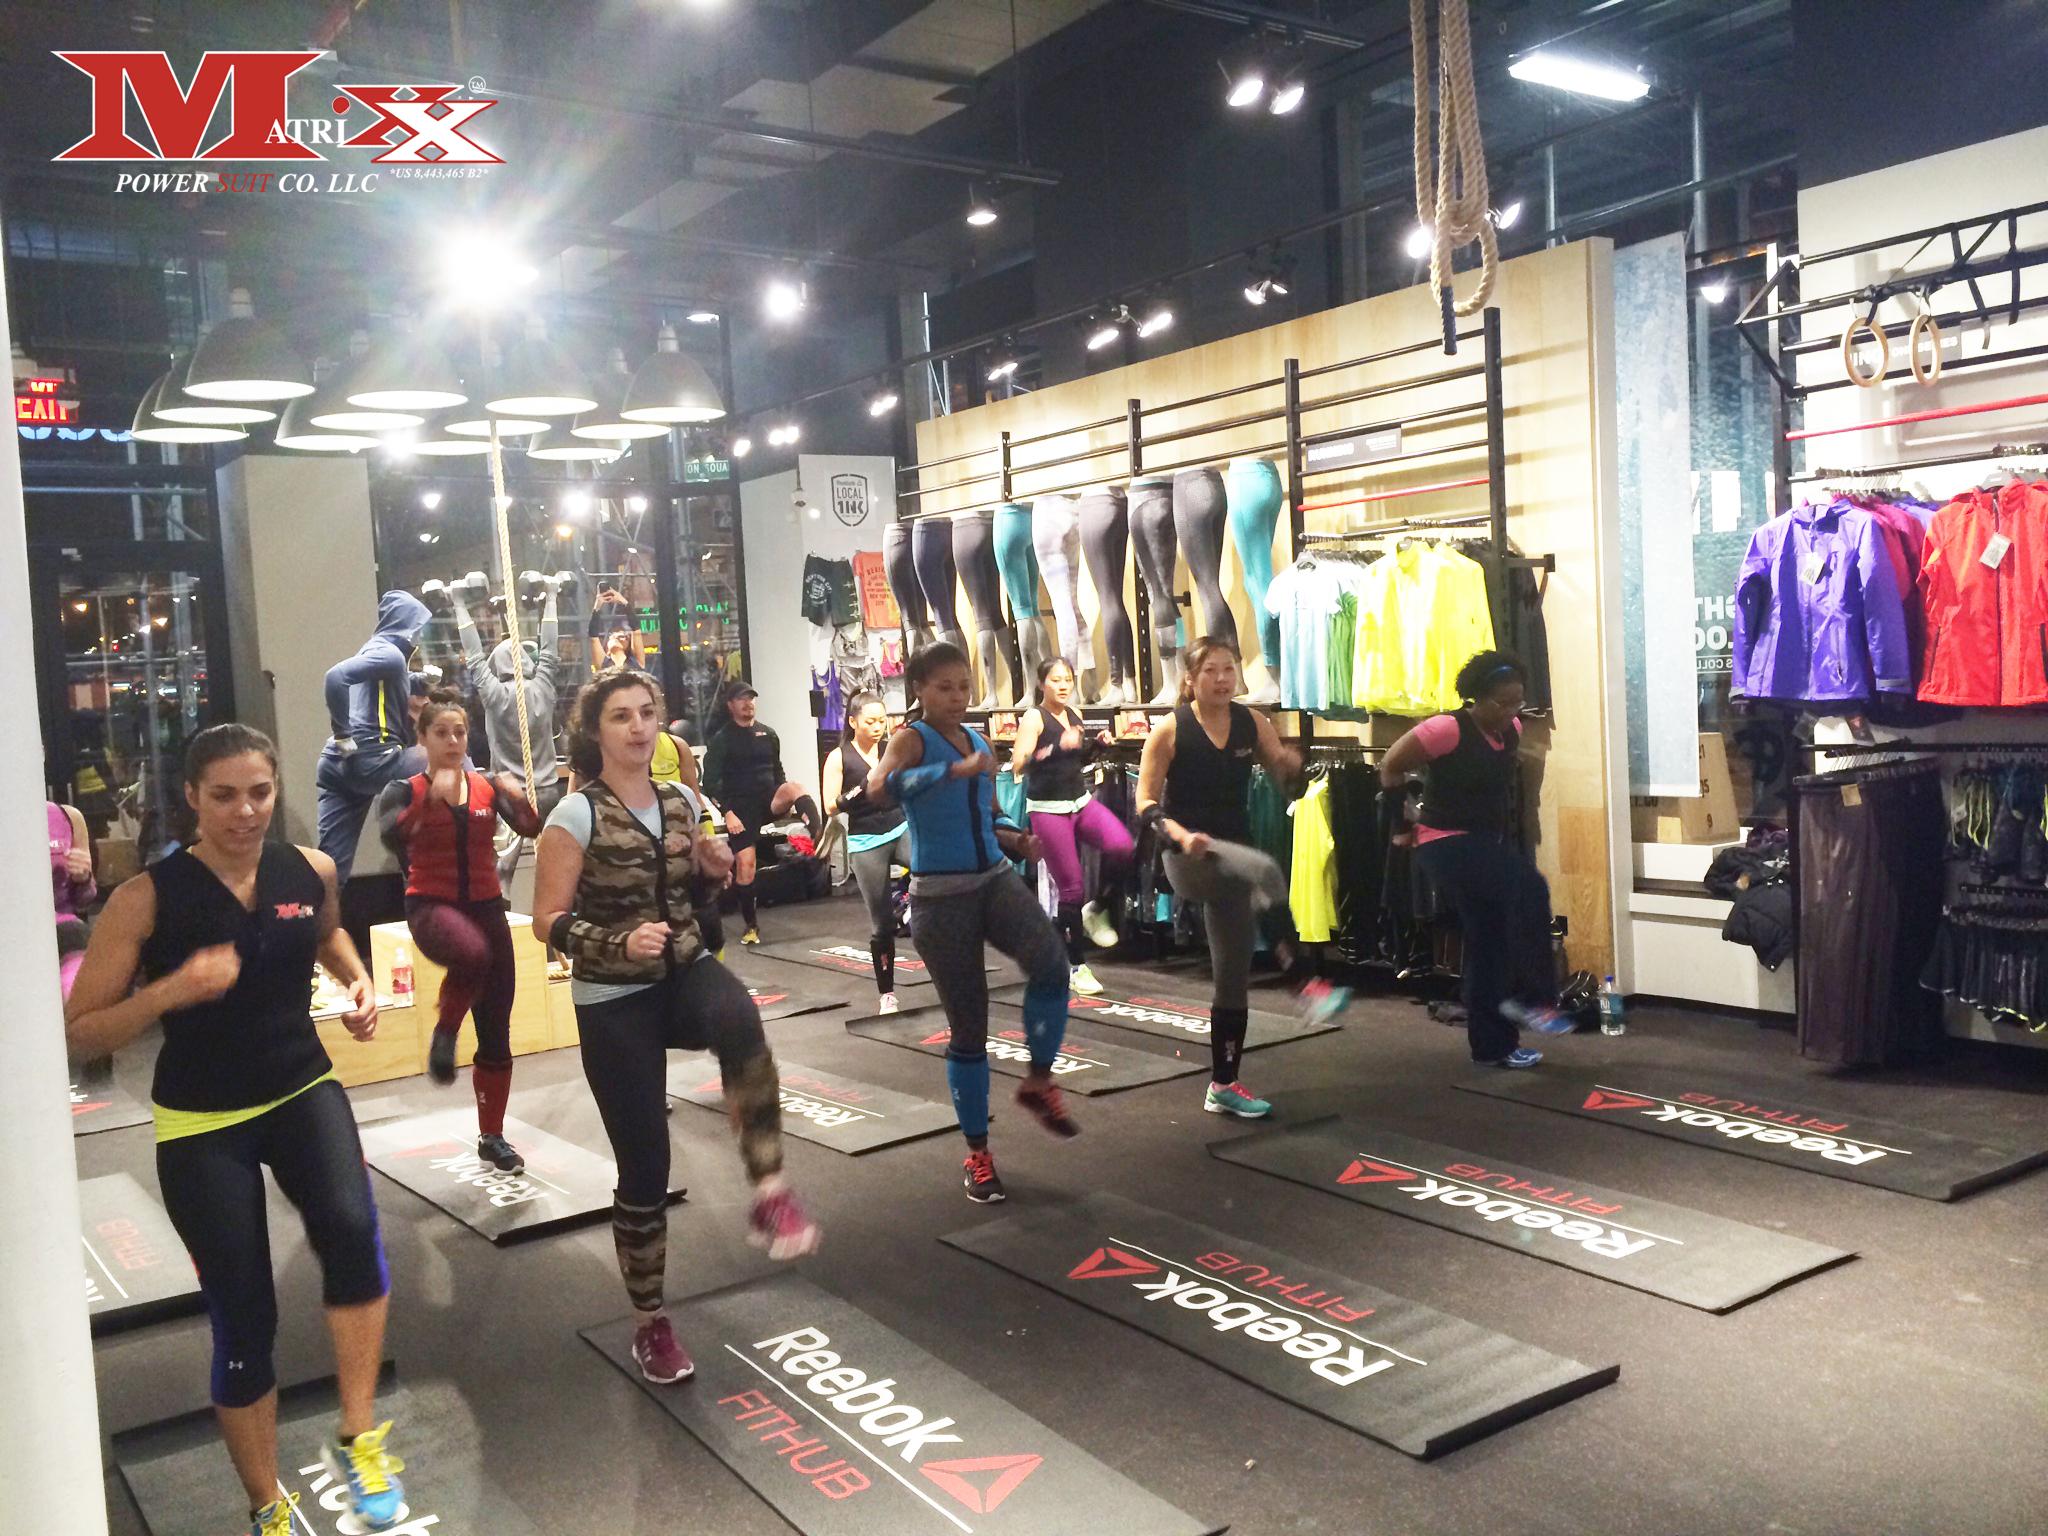 Matrixx Cardio Combat Photo @Reebok FitHub Union Square 11-19-2014